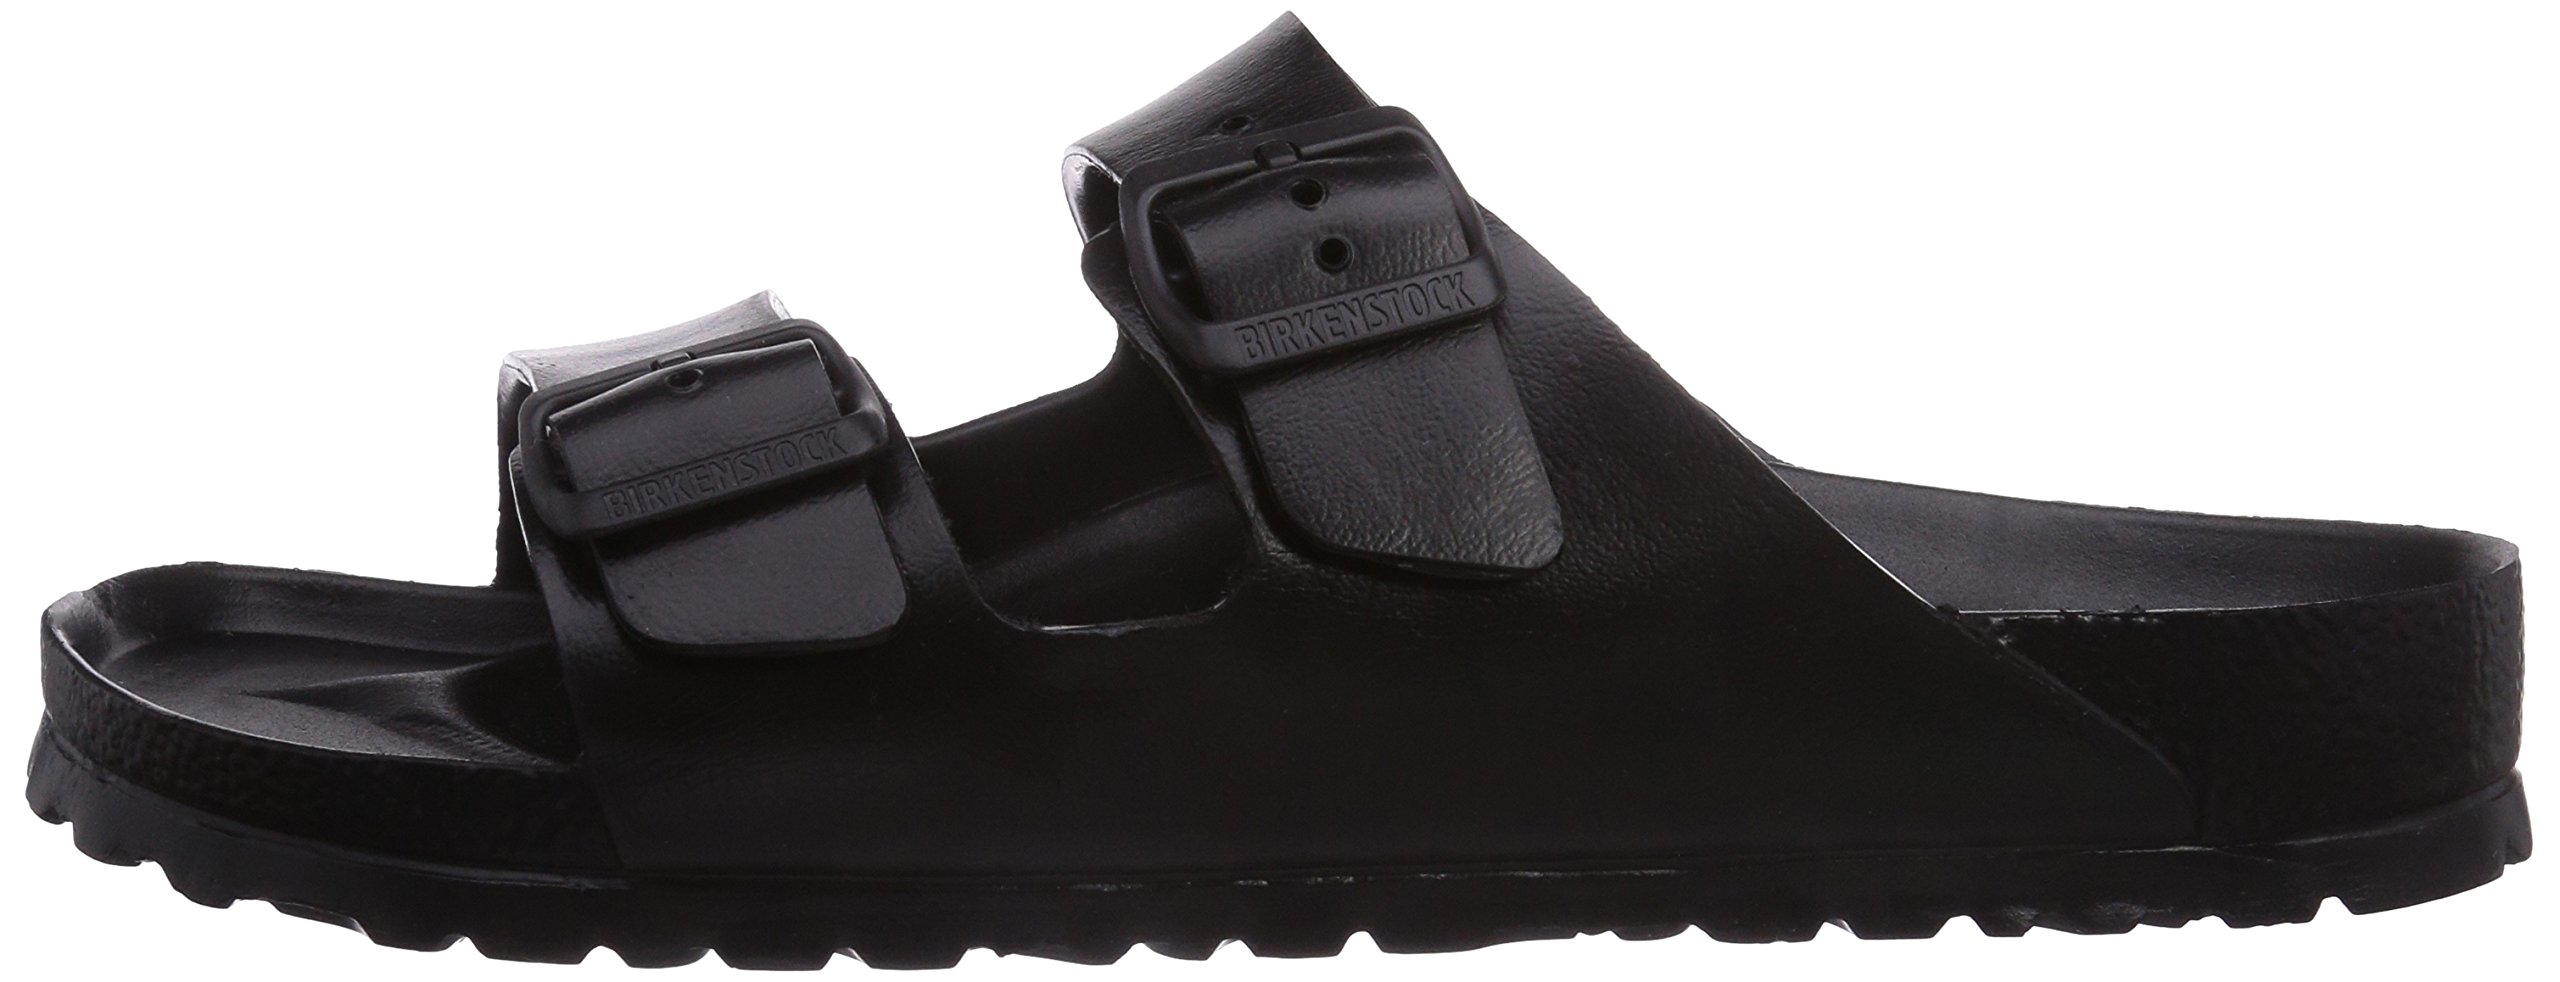 02bb31432bb5 Birkenstock Unisex Arizona Essentials EVA Black Sandals - 43 M EU 12-12.5  B(M) US Women 10-10.5 D(M) US Men - 129421 Black   Sandals   Clothing